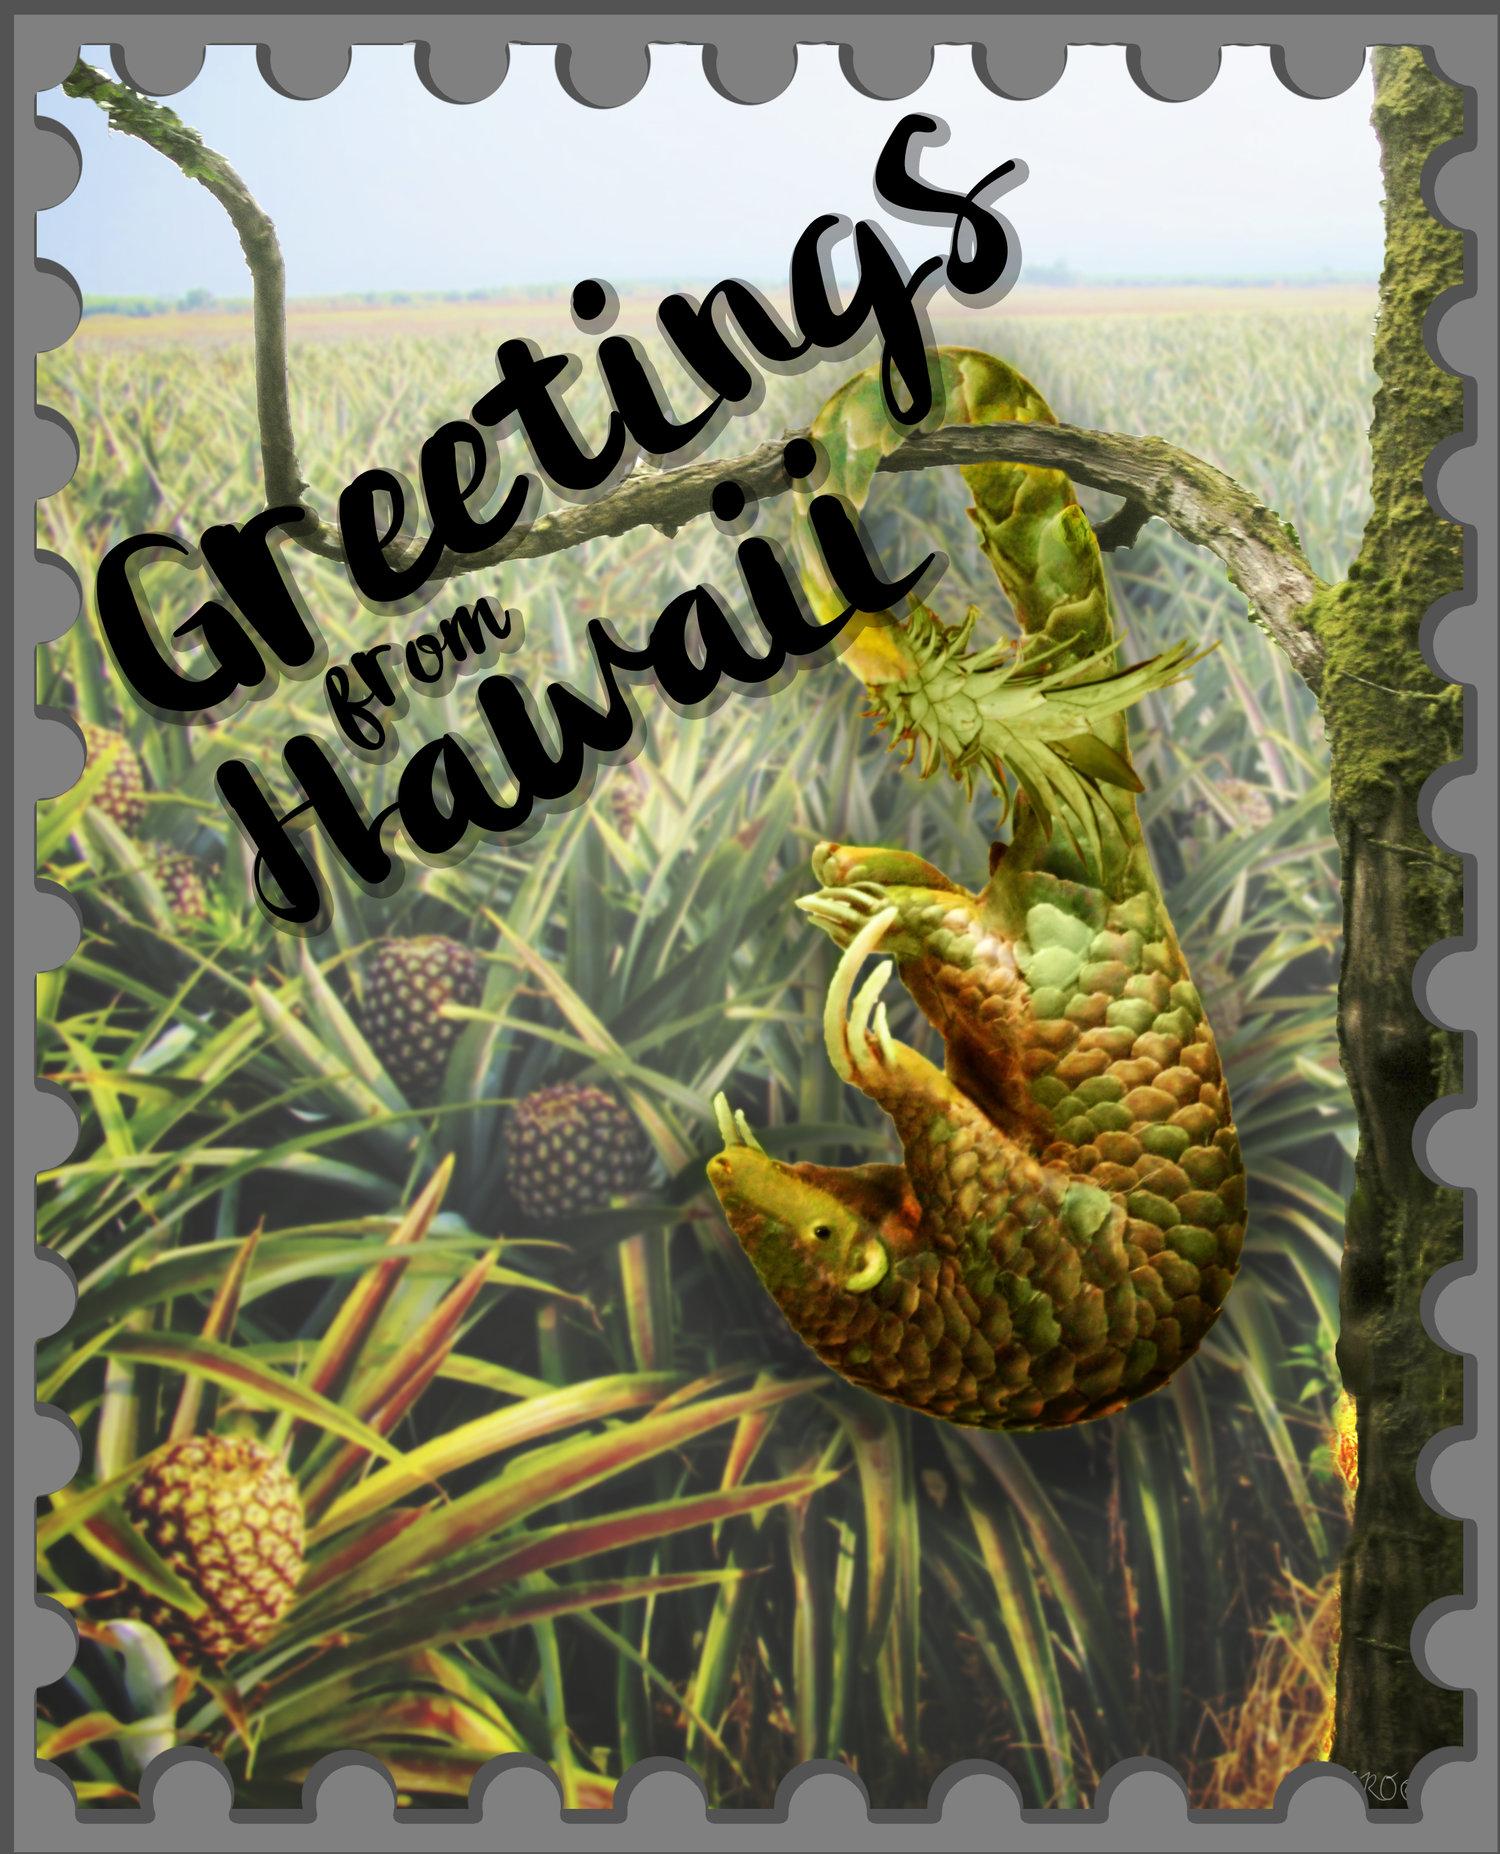 Abby osborne digital design aas abby osborne greetings from hawaii complete piece kristyandbryce Choice Image